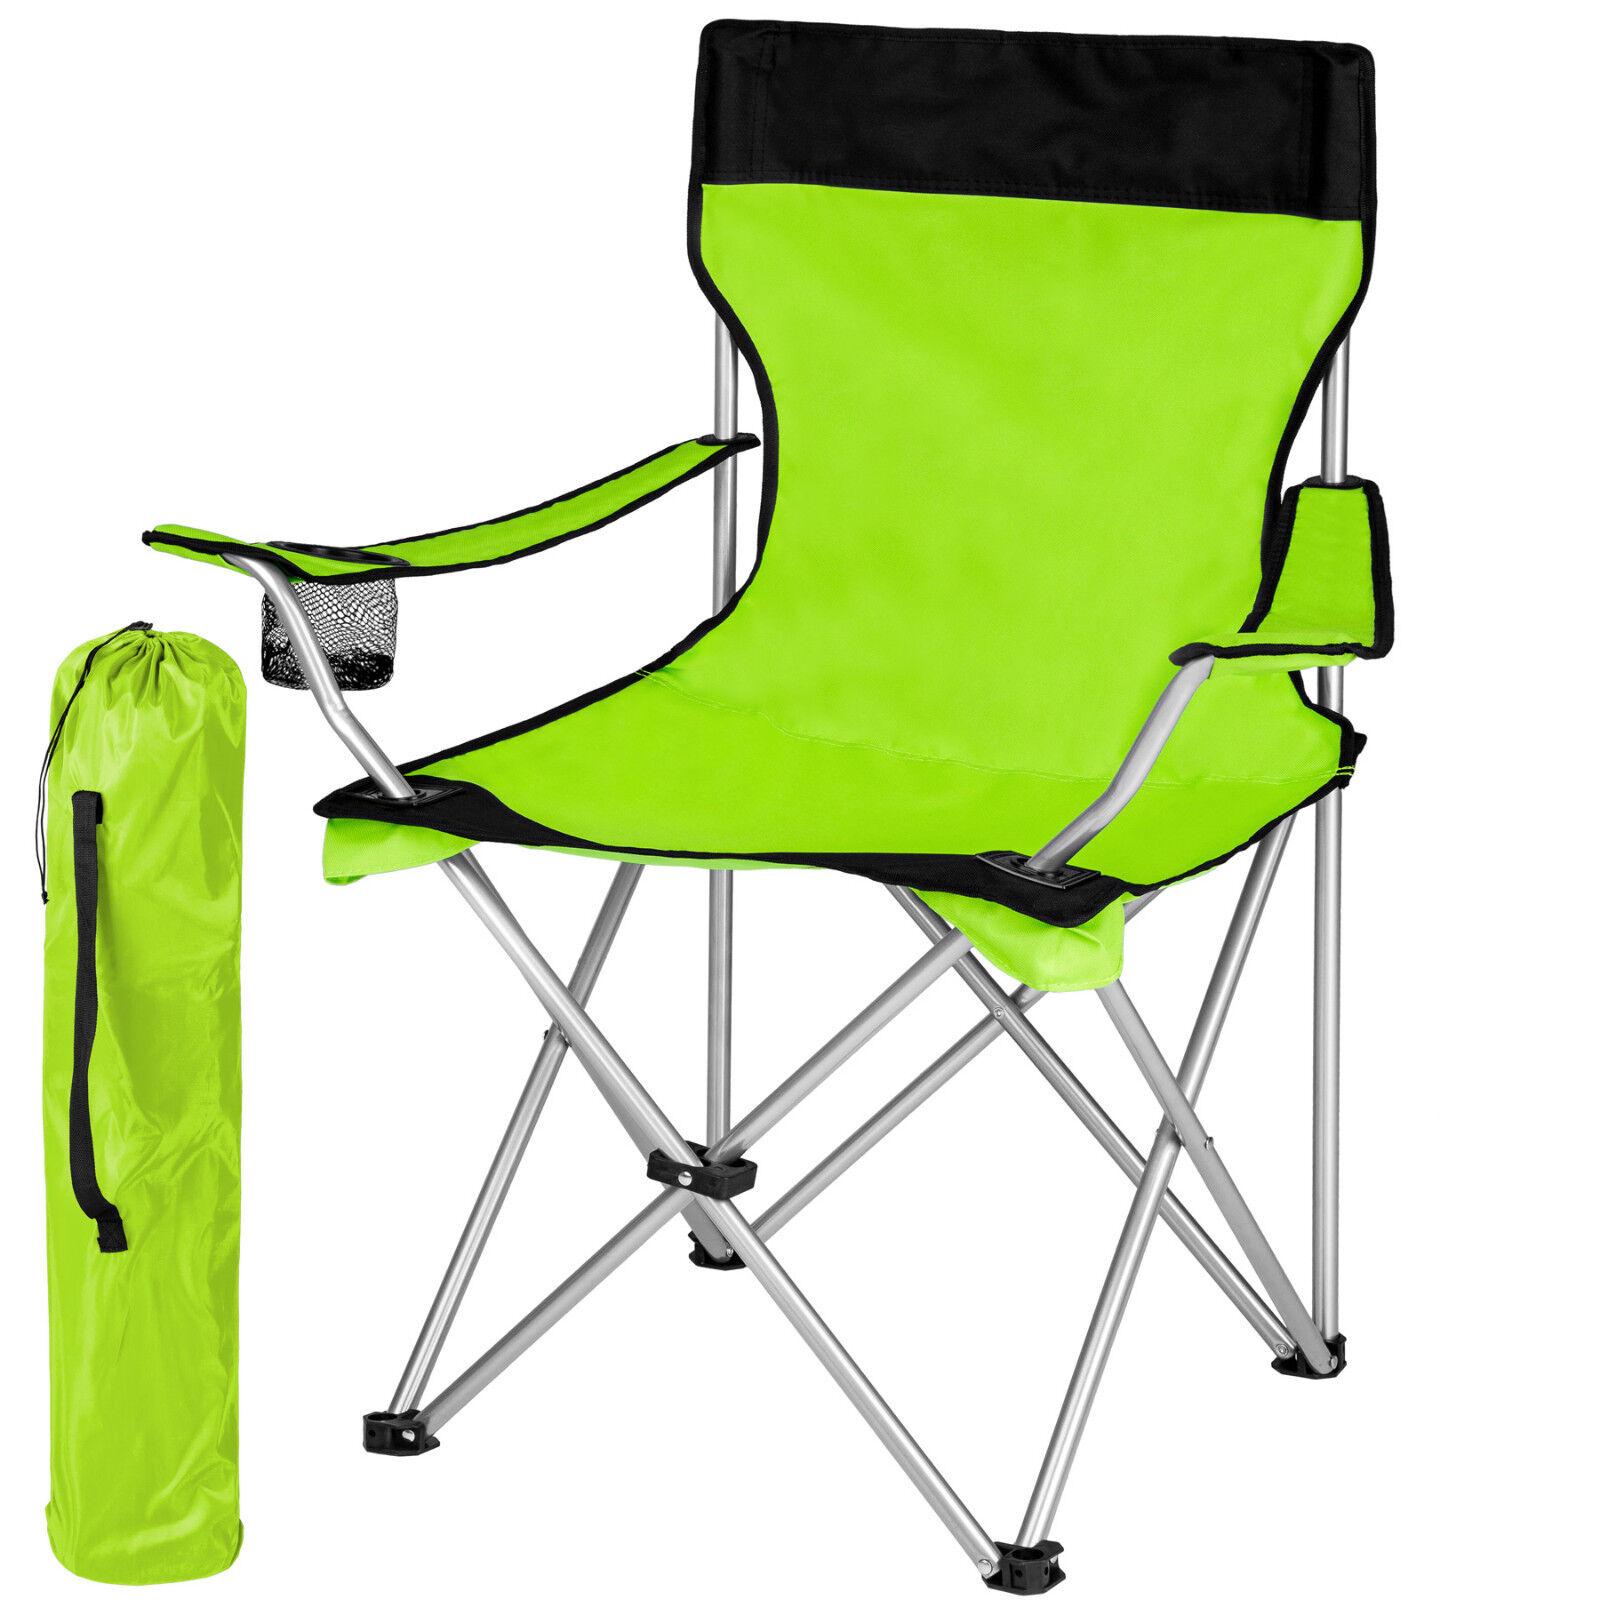 Campingstuhl grün mit hoher Lehne Klappstuhl Regiestuhl Anglerstuhl Gartenstuhl grün Campingstuhl 86d3ea